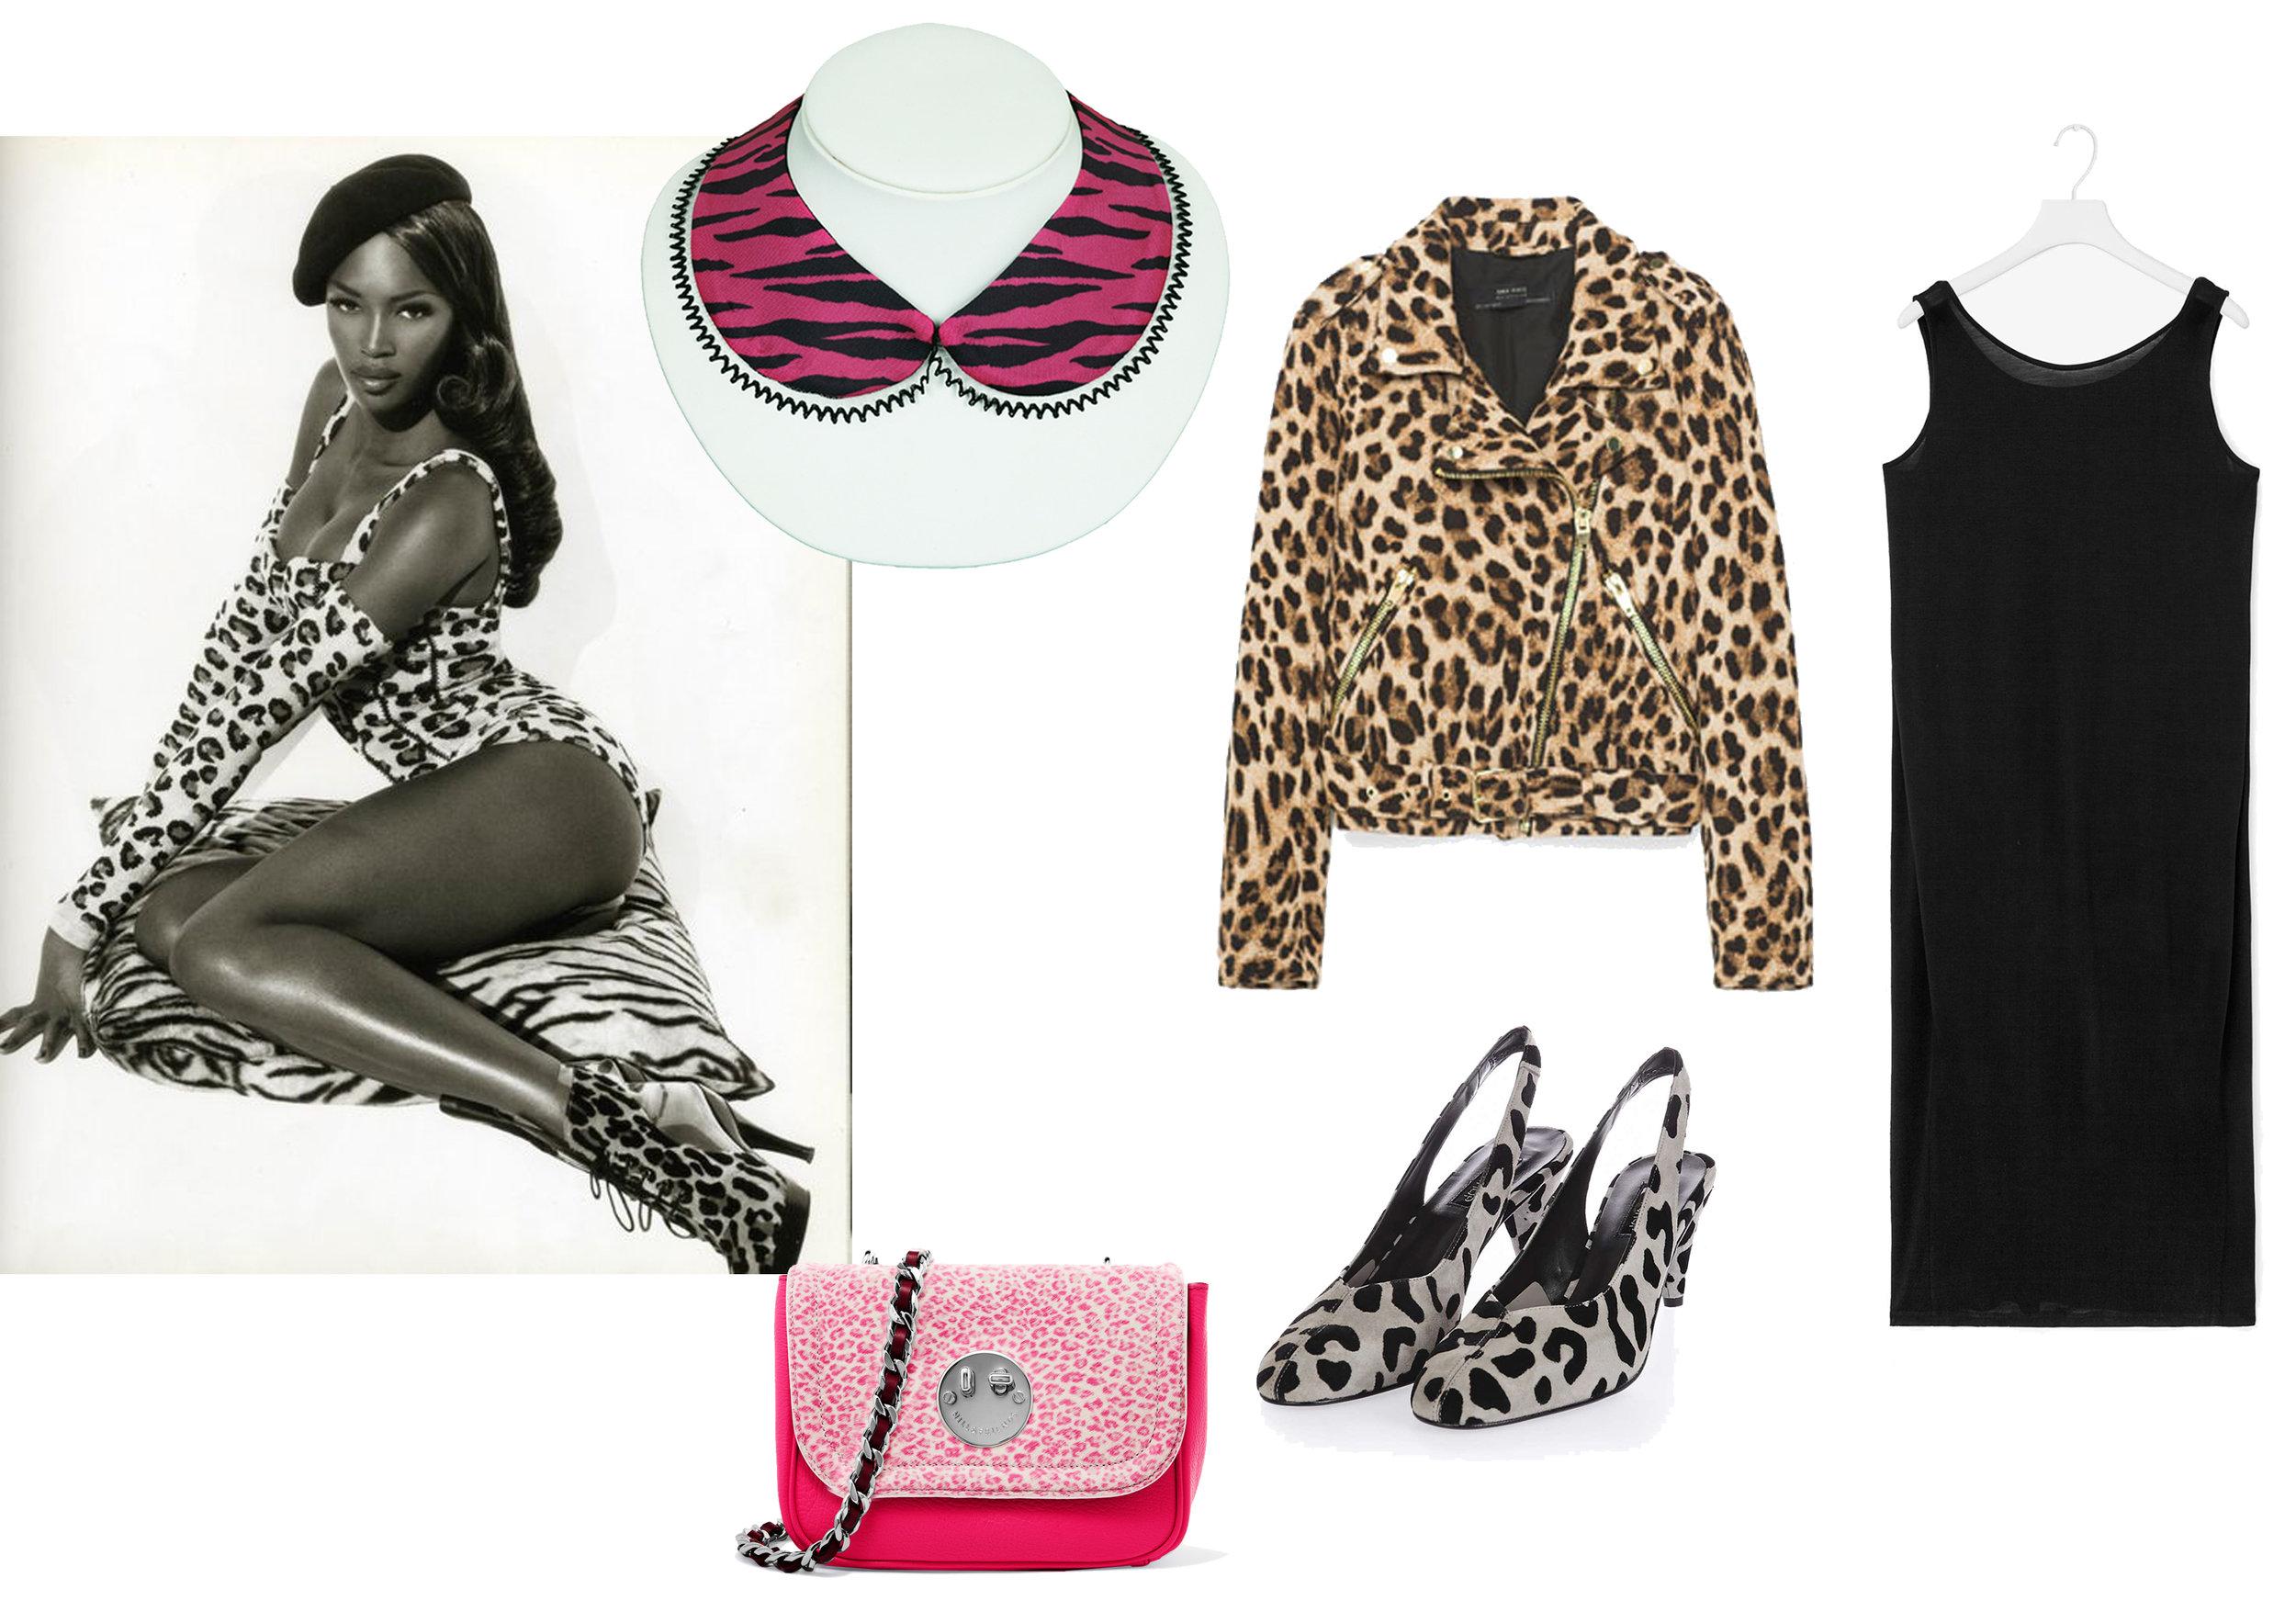 Pink Tiger Print Detachable Collar by Cléo Ferin Mercury ,  Leopard print Jacket by Zara ,  Black Dress by Cos,  Leopard Print Shoes by Top Shop, Pink Bag by Hillier & Friends.